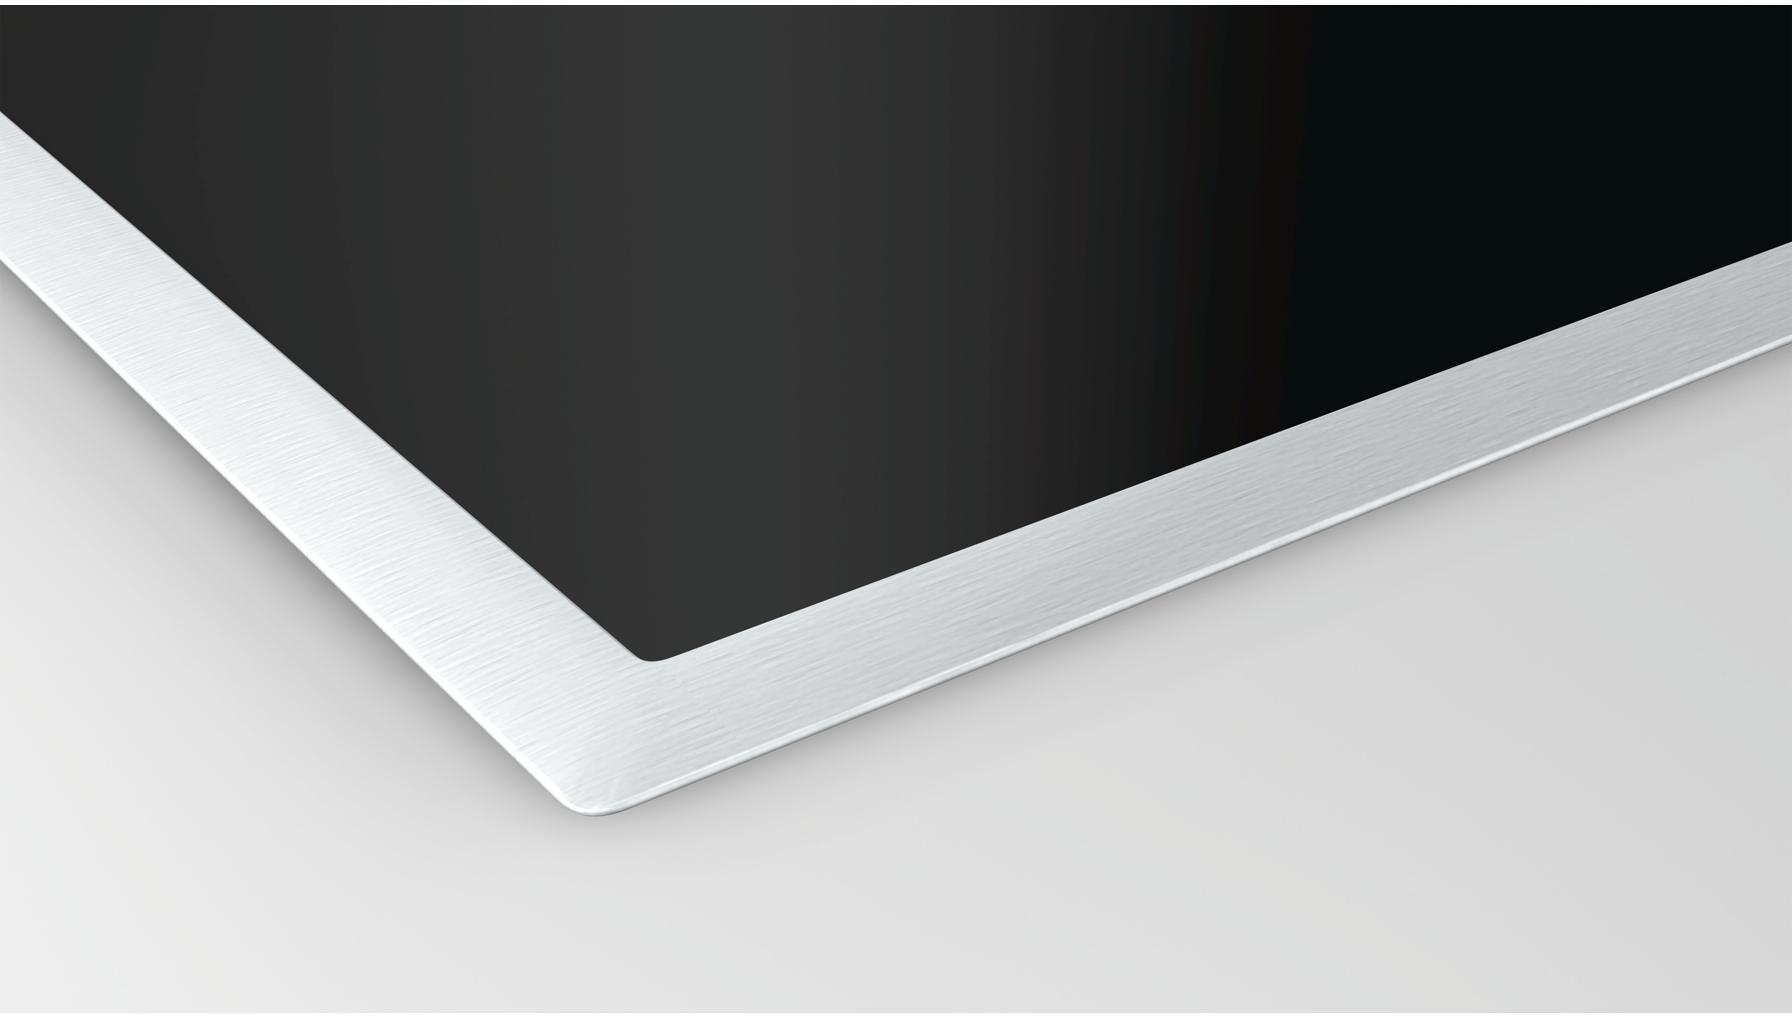 neff tbt1816n autarkes elektro kochfeld glaskeramik 80 cm breit edelstahlrahmen t18bt16n0. Black Bedroom Furniture Sets. Home Design Ideas